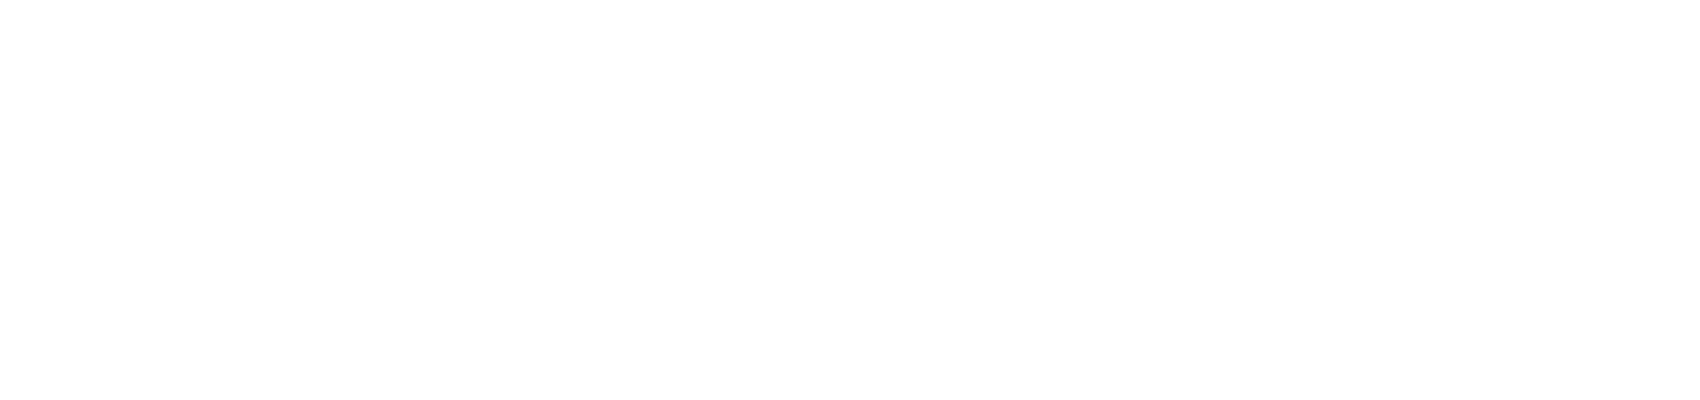 The Antidote logo.